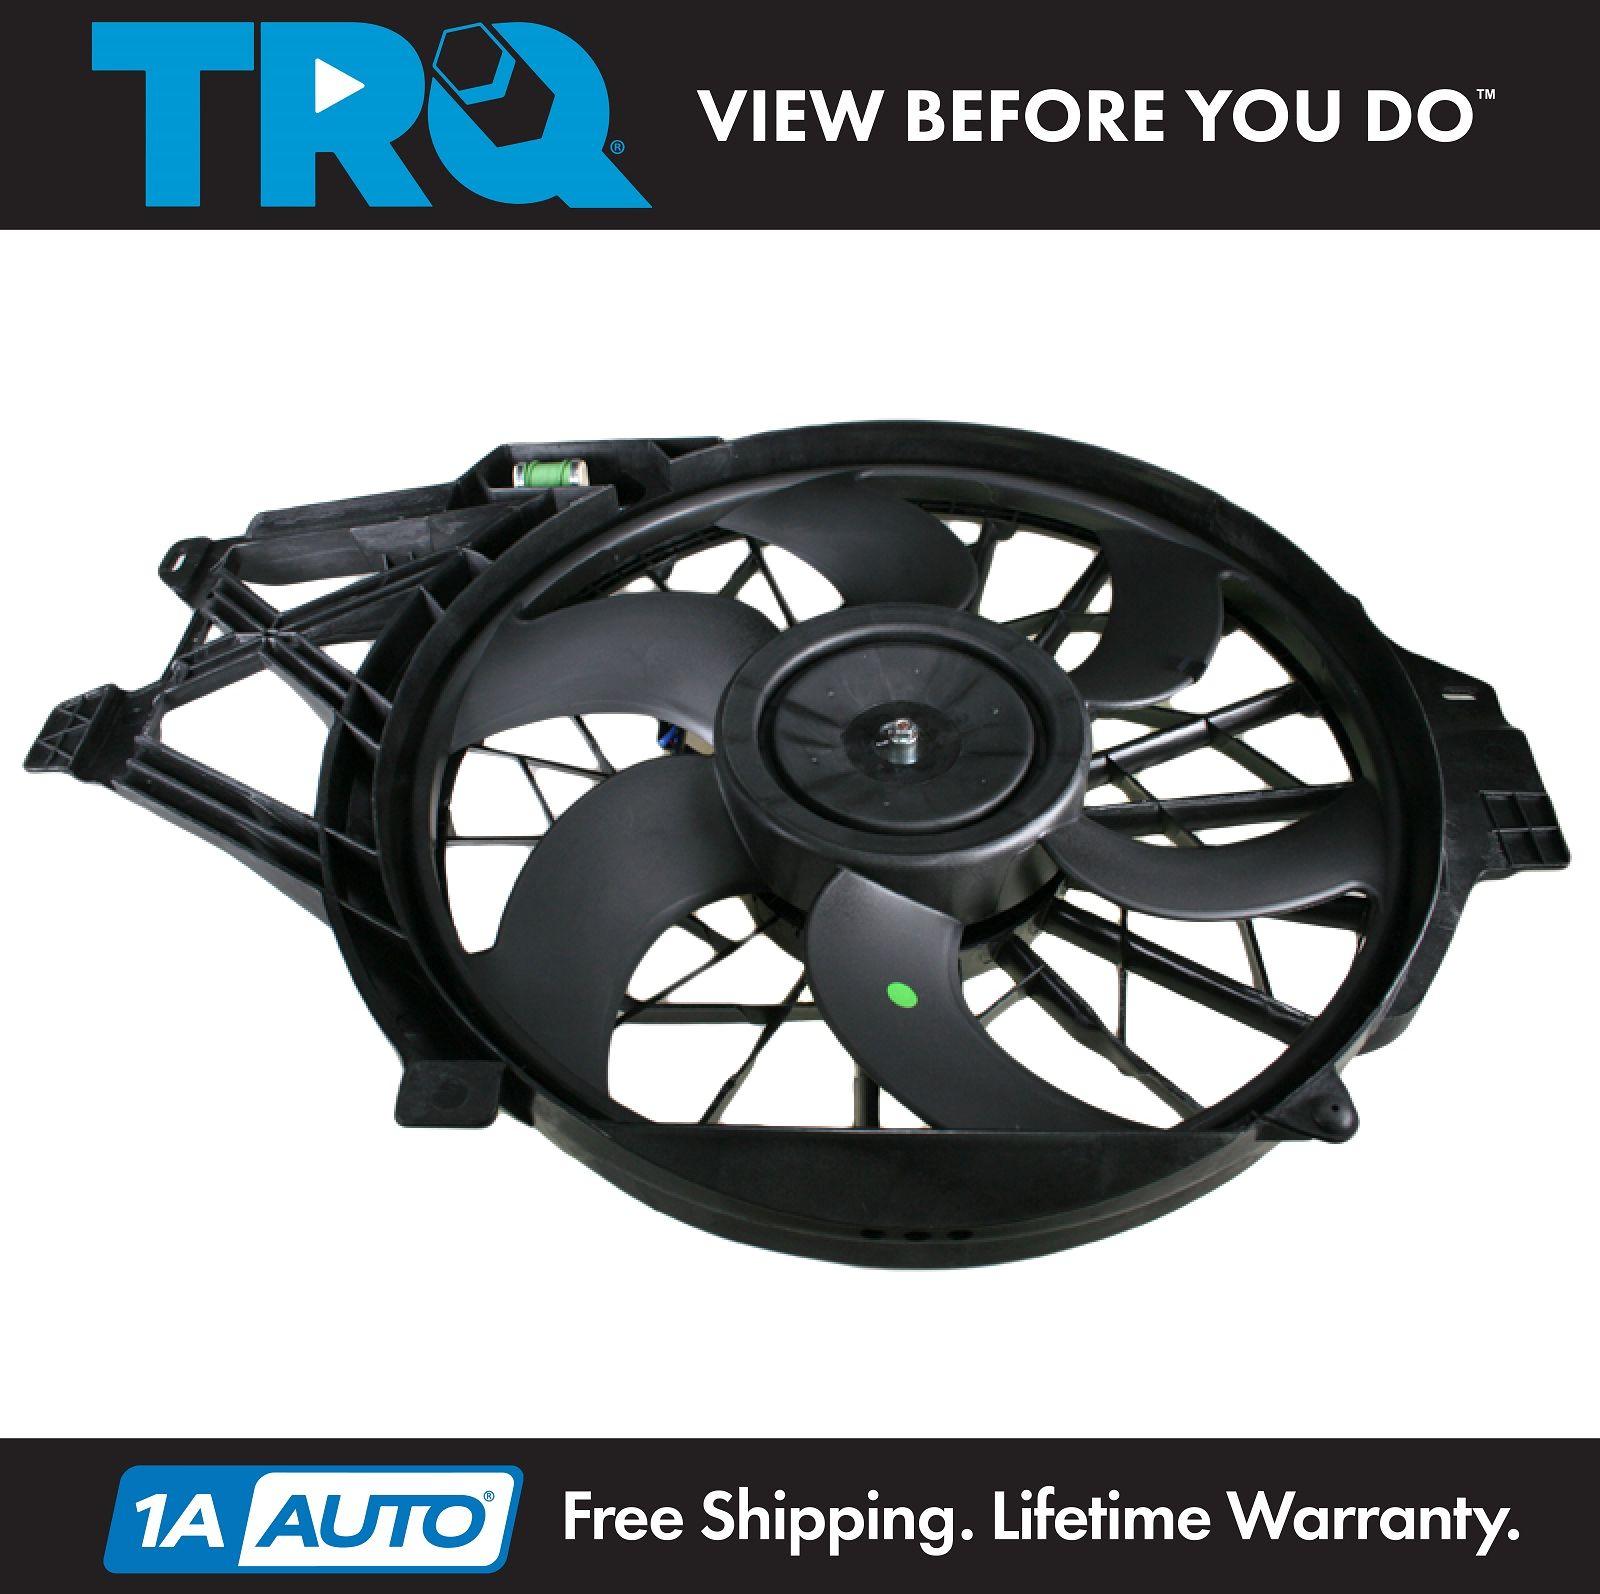 Engine Cooling Fan Assembly-Radiator Fan Assembly fits 01-04 Mustang 4.6L-V8